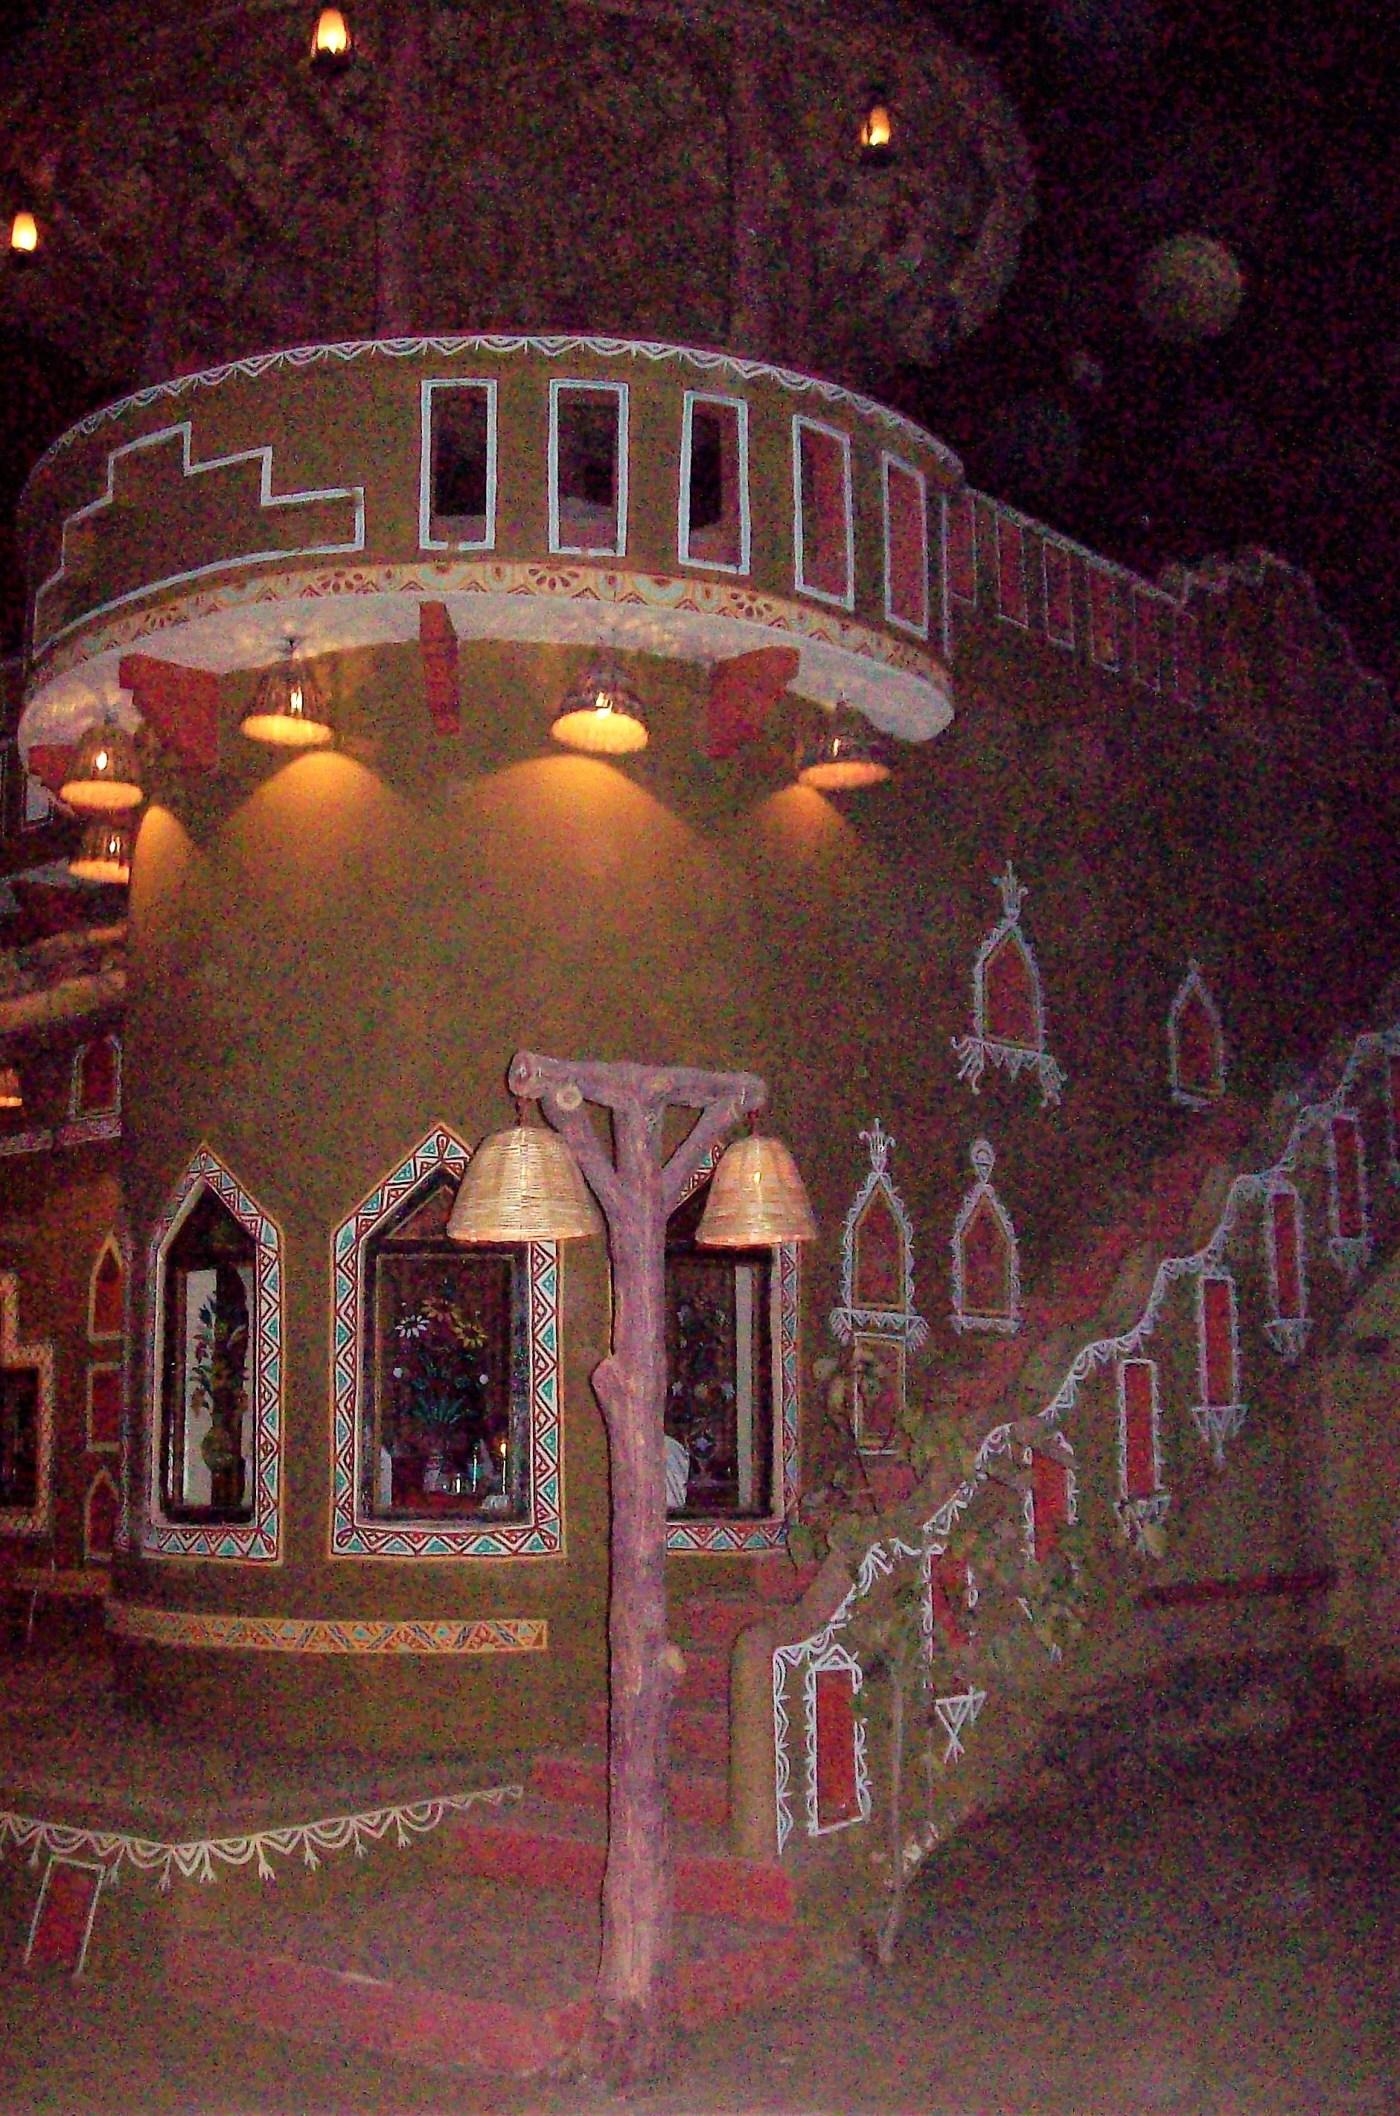 Cottage in chowki dhani, jaipur India